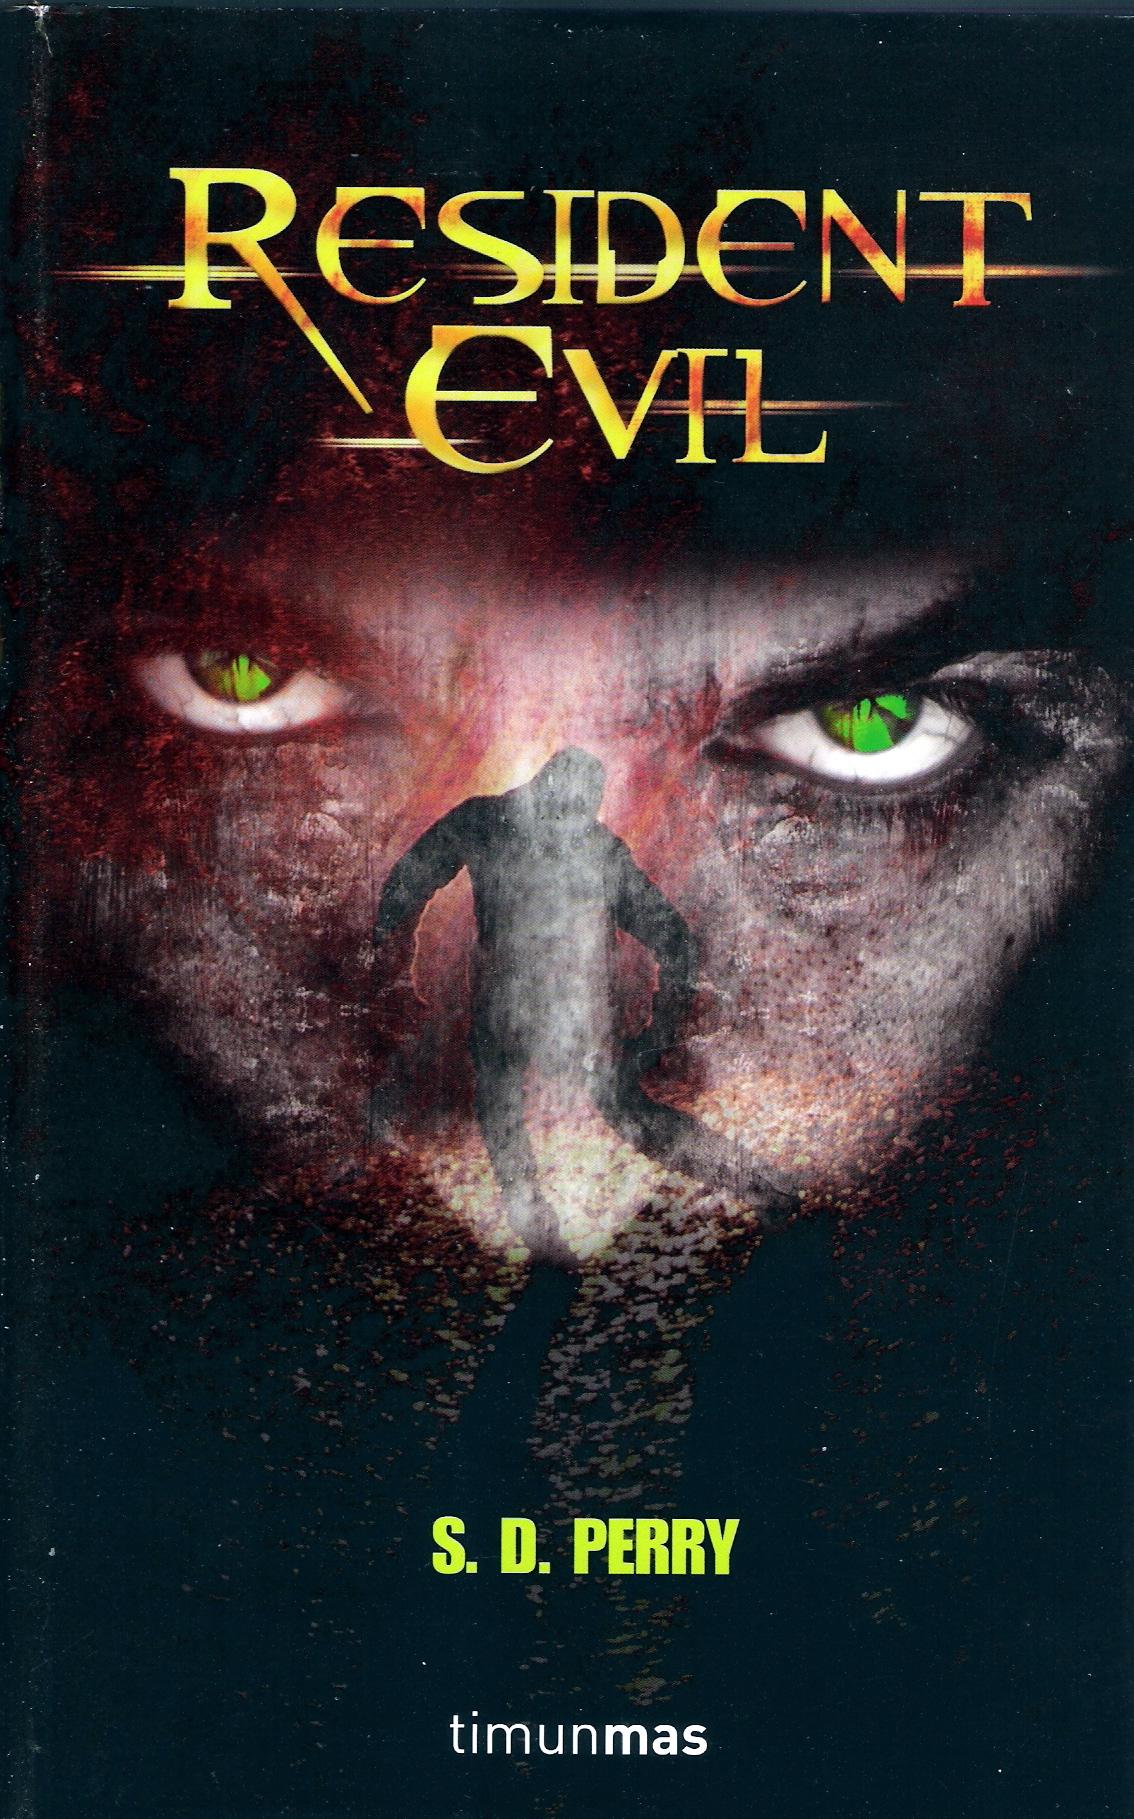 Coleccionista Resident Evil, Vol. 1